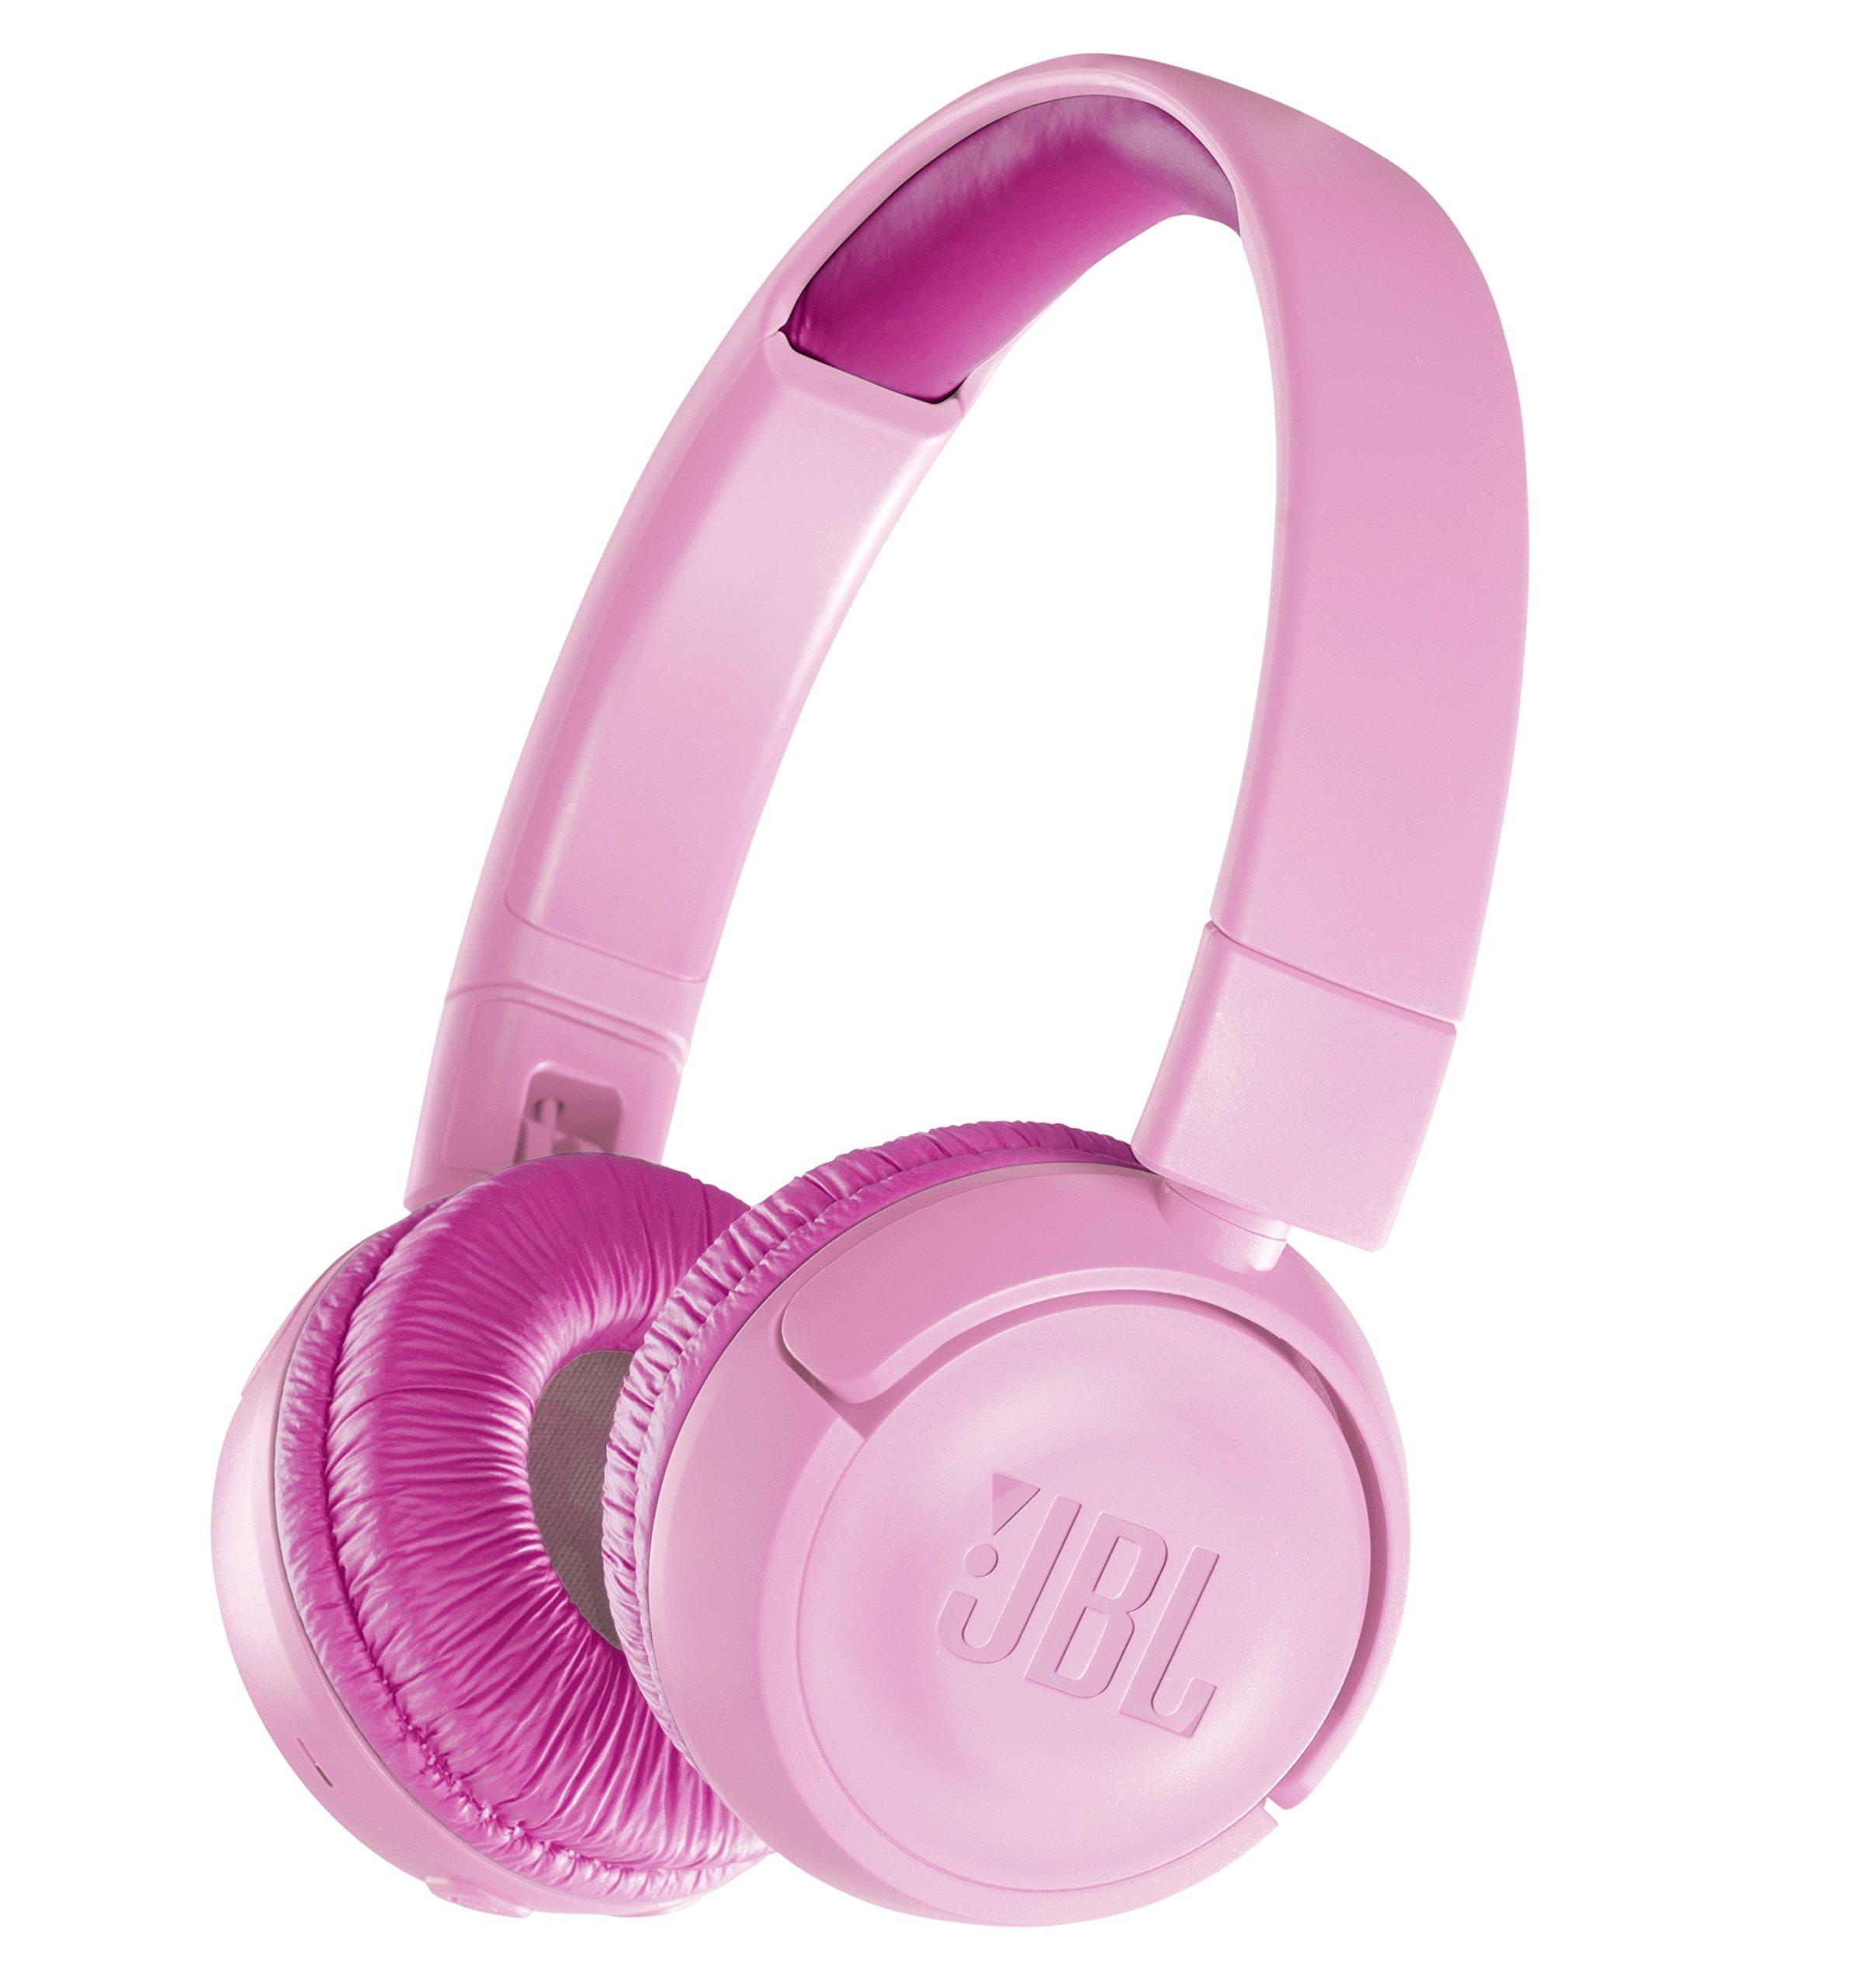 JBL JR300BT音量調整機能付きBluetooth BluetoothヘッドセットピンクJBLJR300BTPIK国内正規品